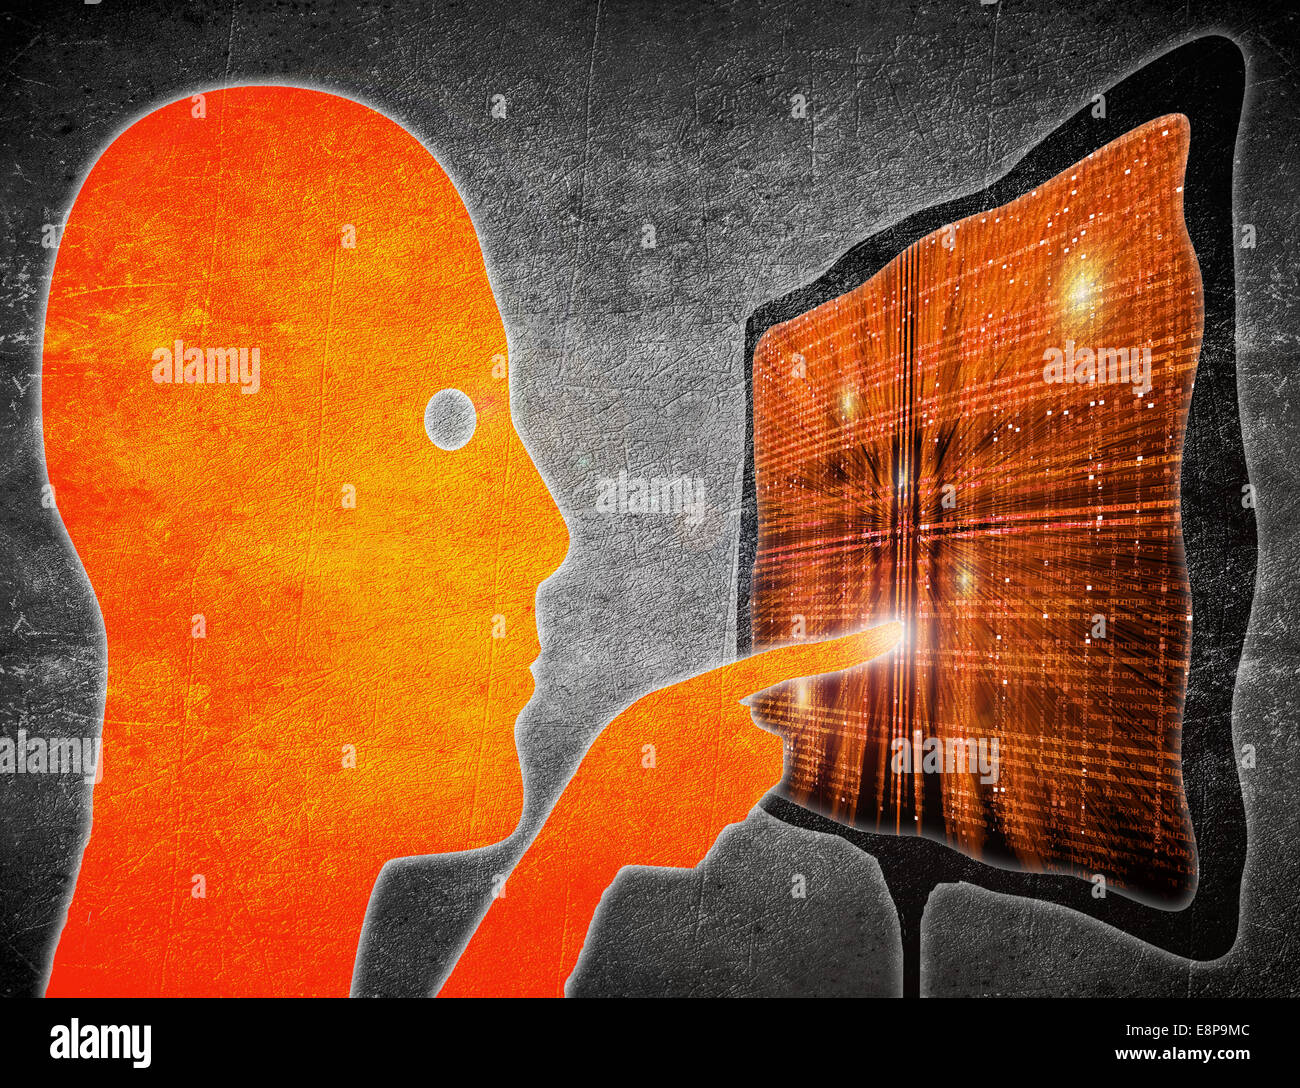 Hombre que toca la pantalla táctil en color naranja negro ilustración digital Imagen De Stock